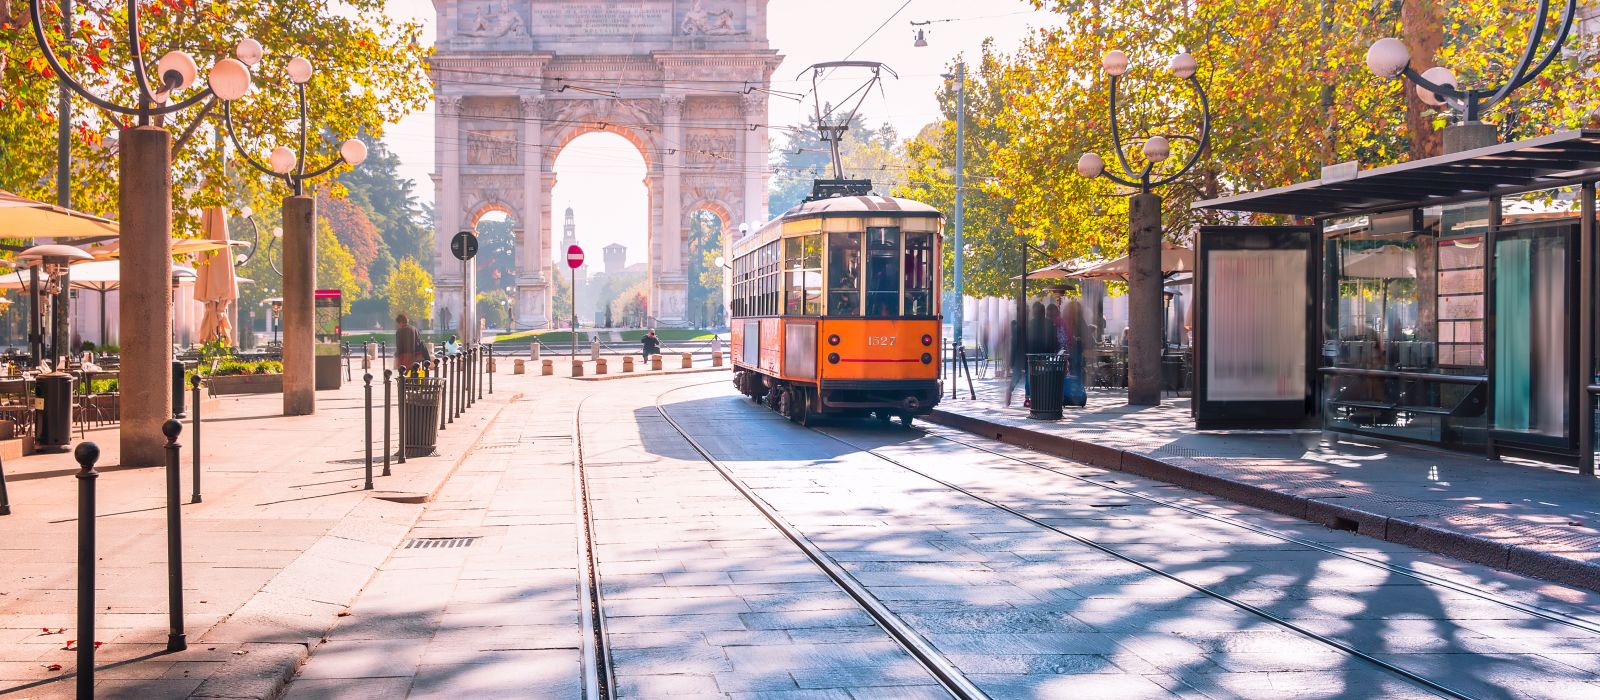 Destination Milan Italy